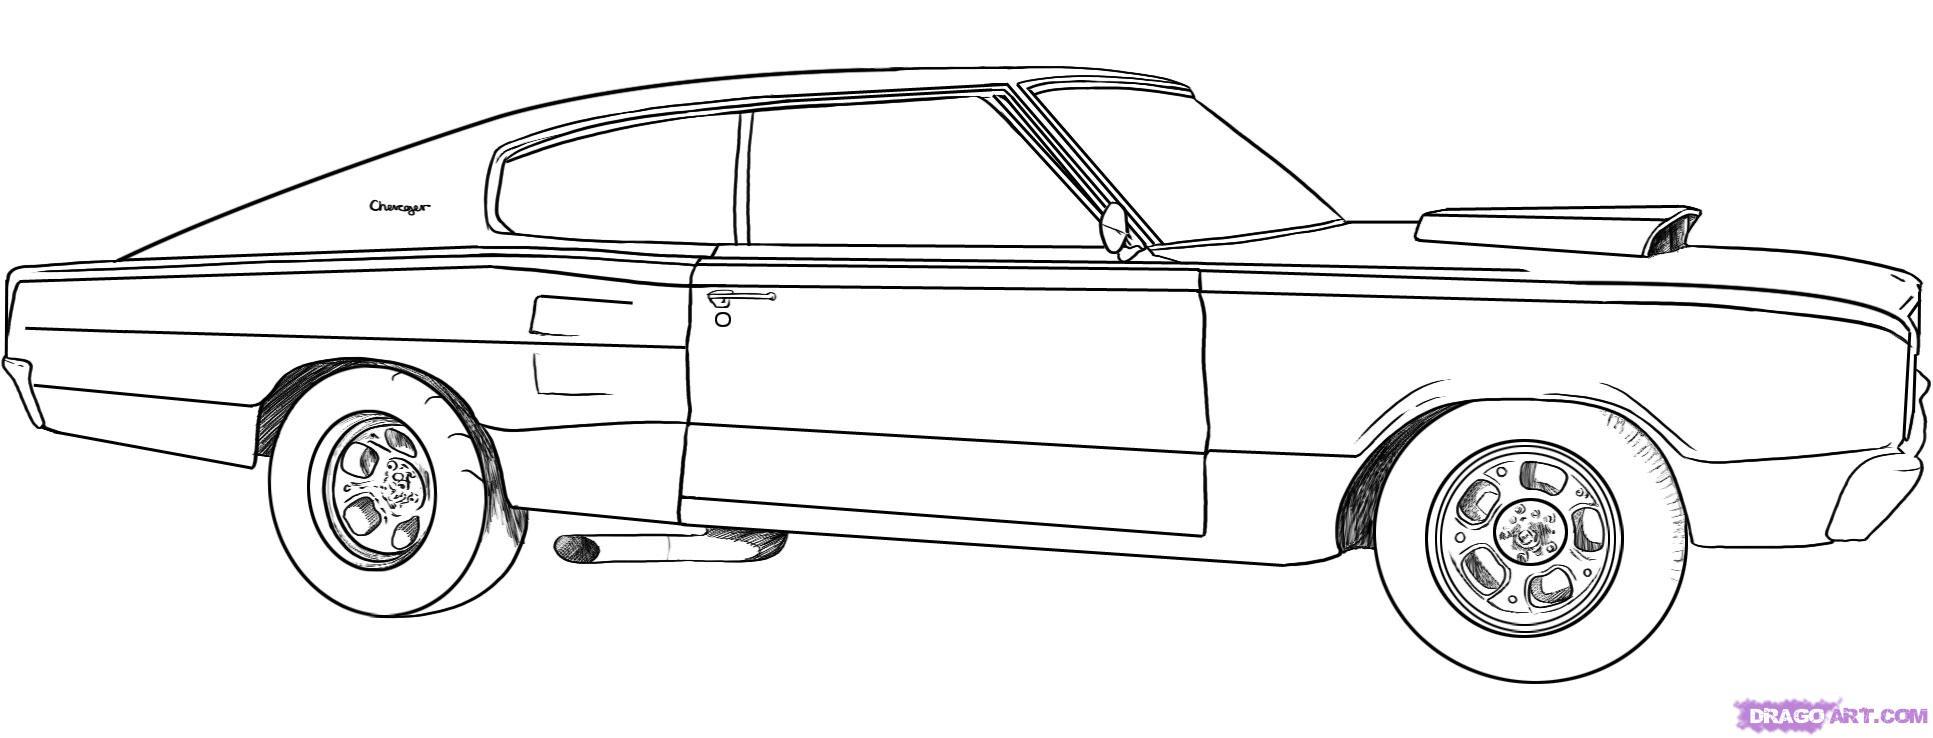 1950s dodge cars